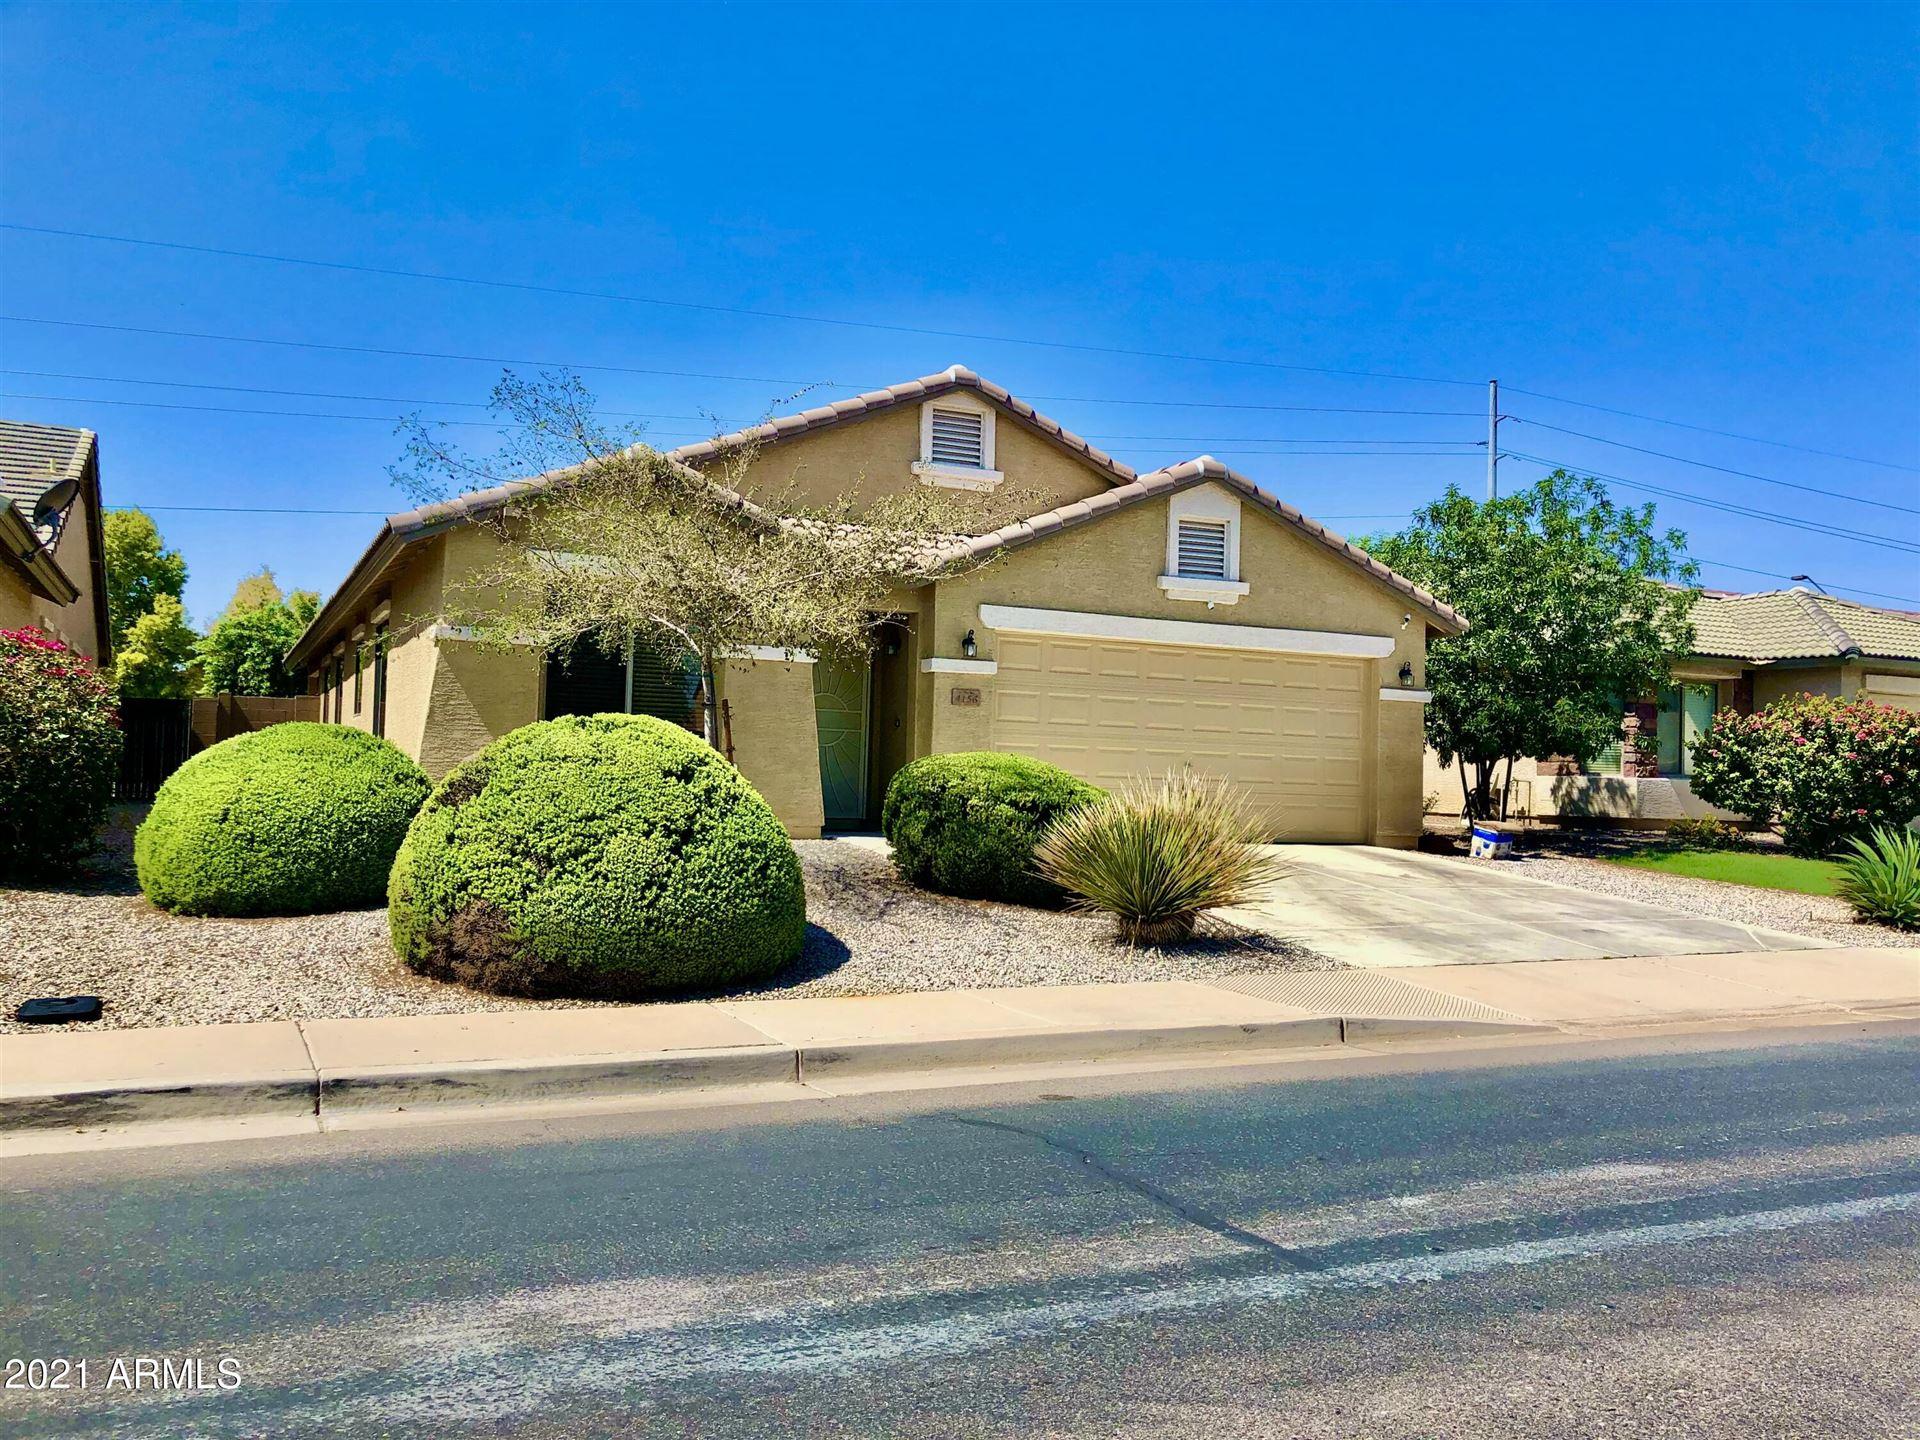 Photo of 4156 S 250TH Lane, Buckeye, AZ 85326 (MLS # 6296169)